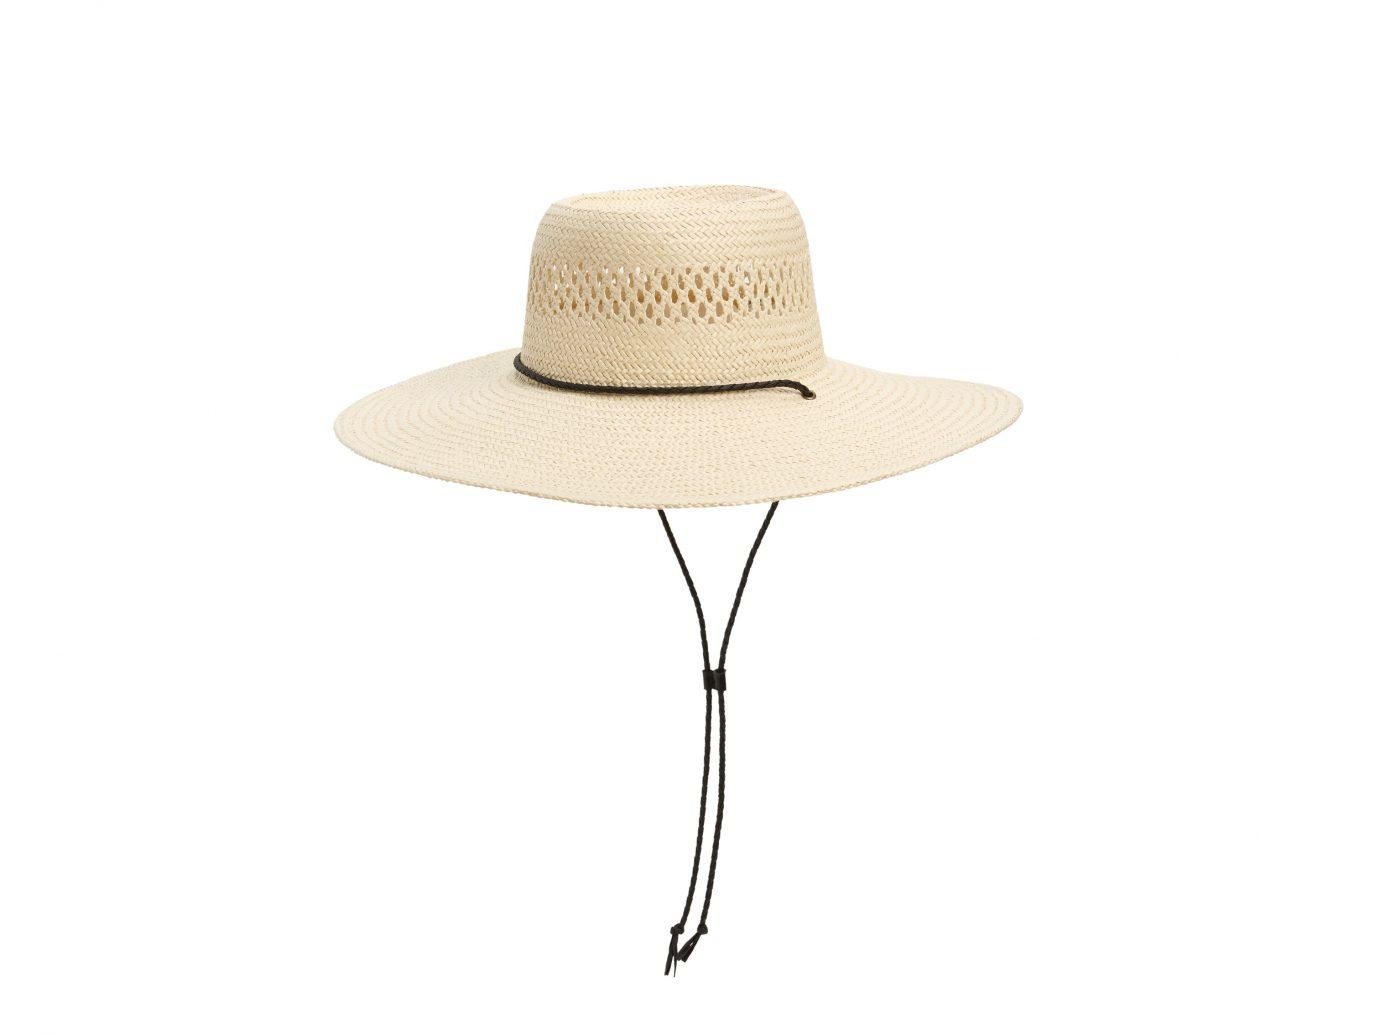 Madewell Georgia Stampede Straw Hat